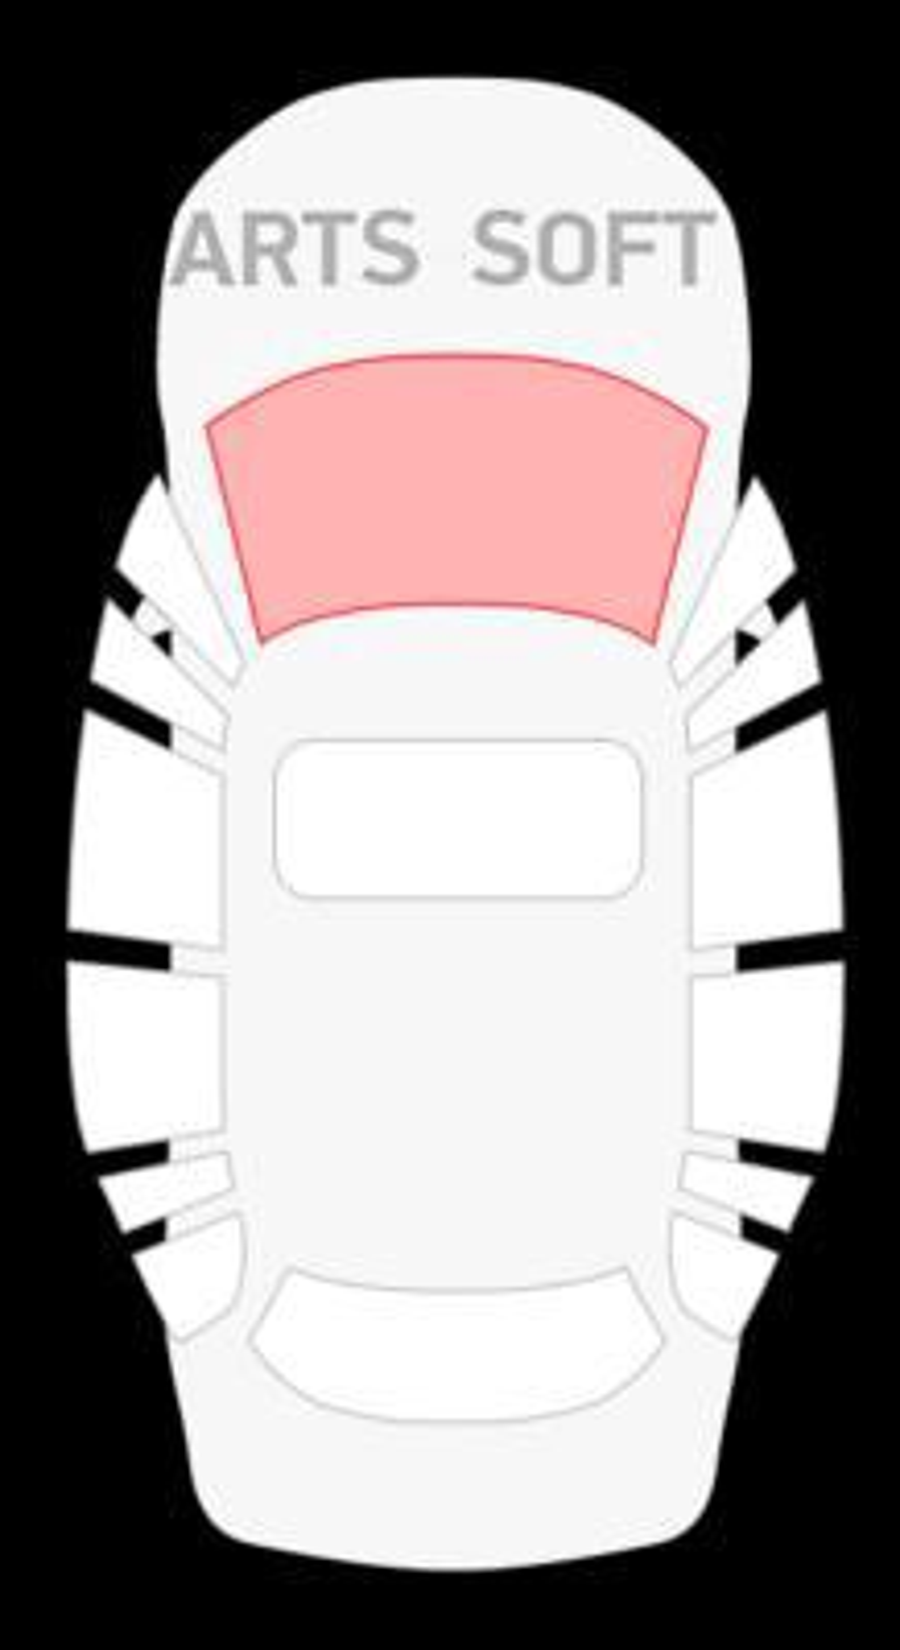 Honda Accord CF3/CF4/CF5 4D седан (97-01) / CF6/CF7 5D универсал (97-02) / Torneo CF3 4D седан (00-) с ом (П)